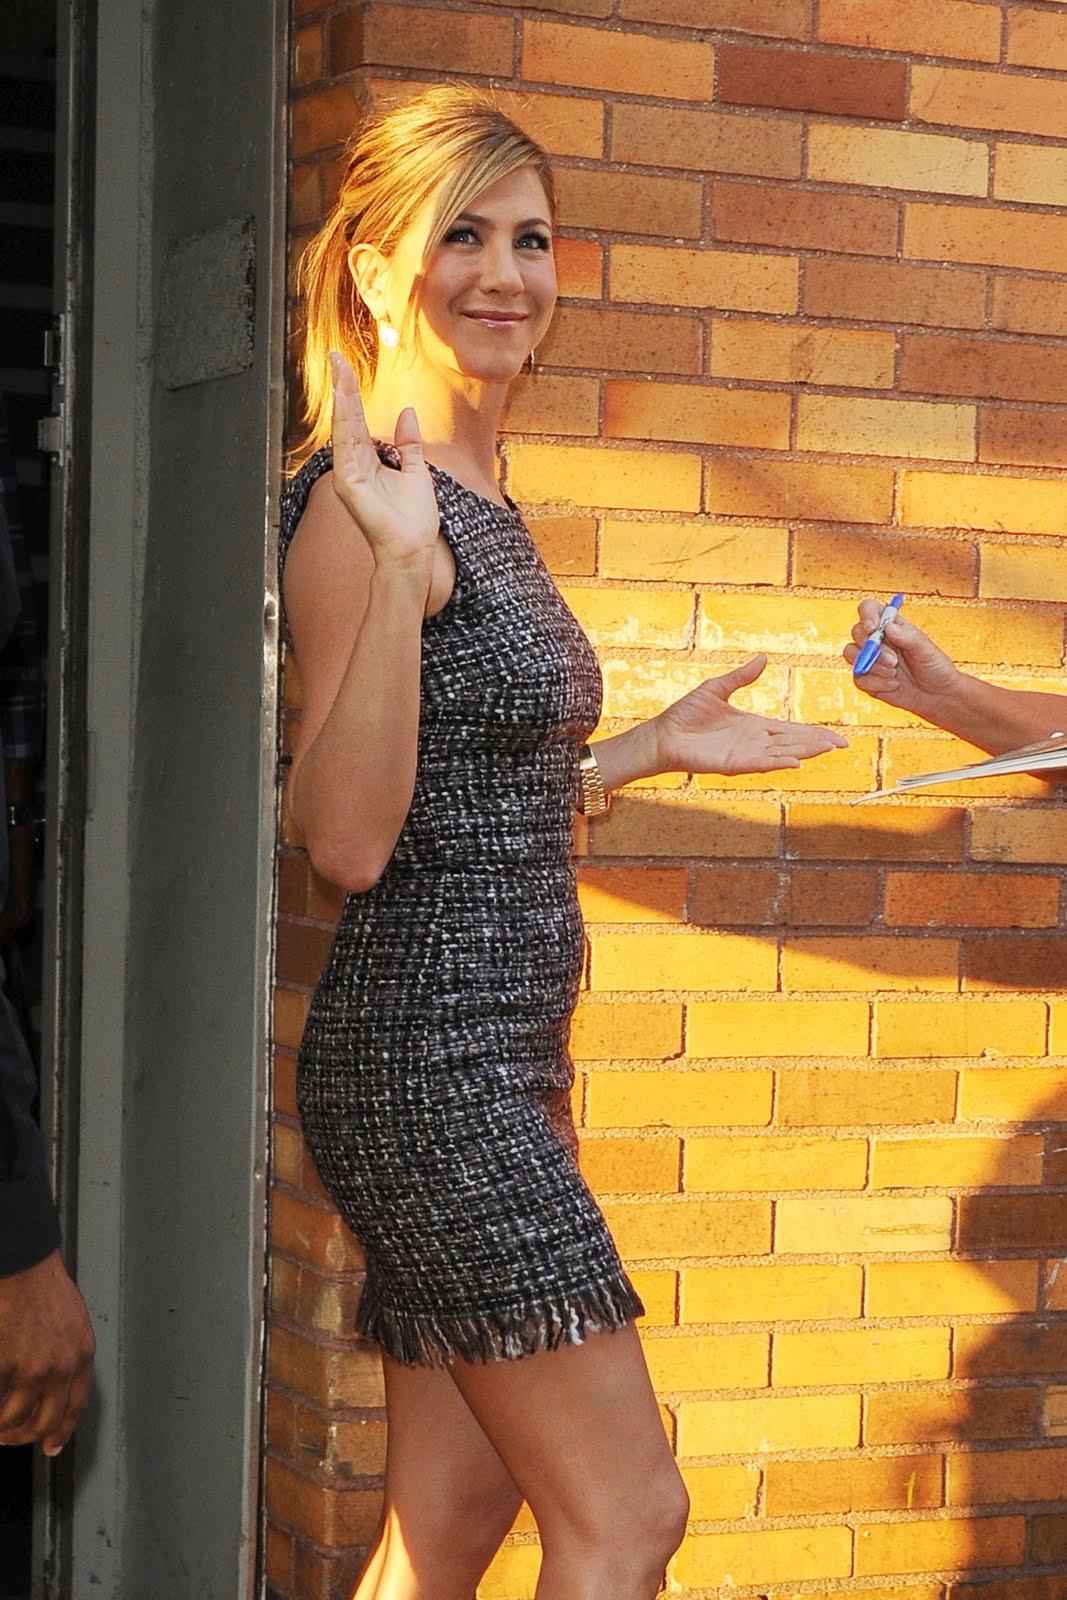 http://4.bp.blogspot.com/_te_-NCYOffc/TG6hoAXT_dI/AAAAAAAACbs/Xo2AgVW7y14/s1600/Jennifer-Aniston_legs_8.jpg